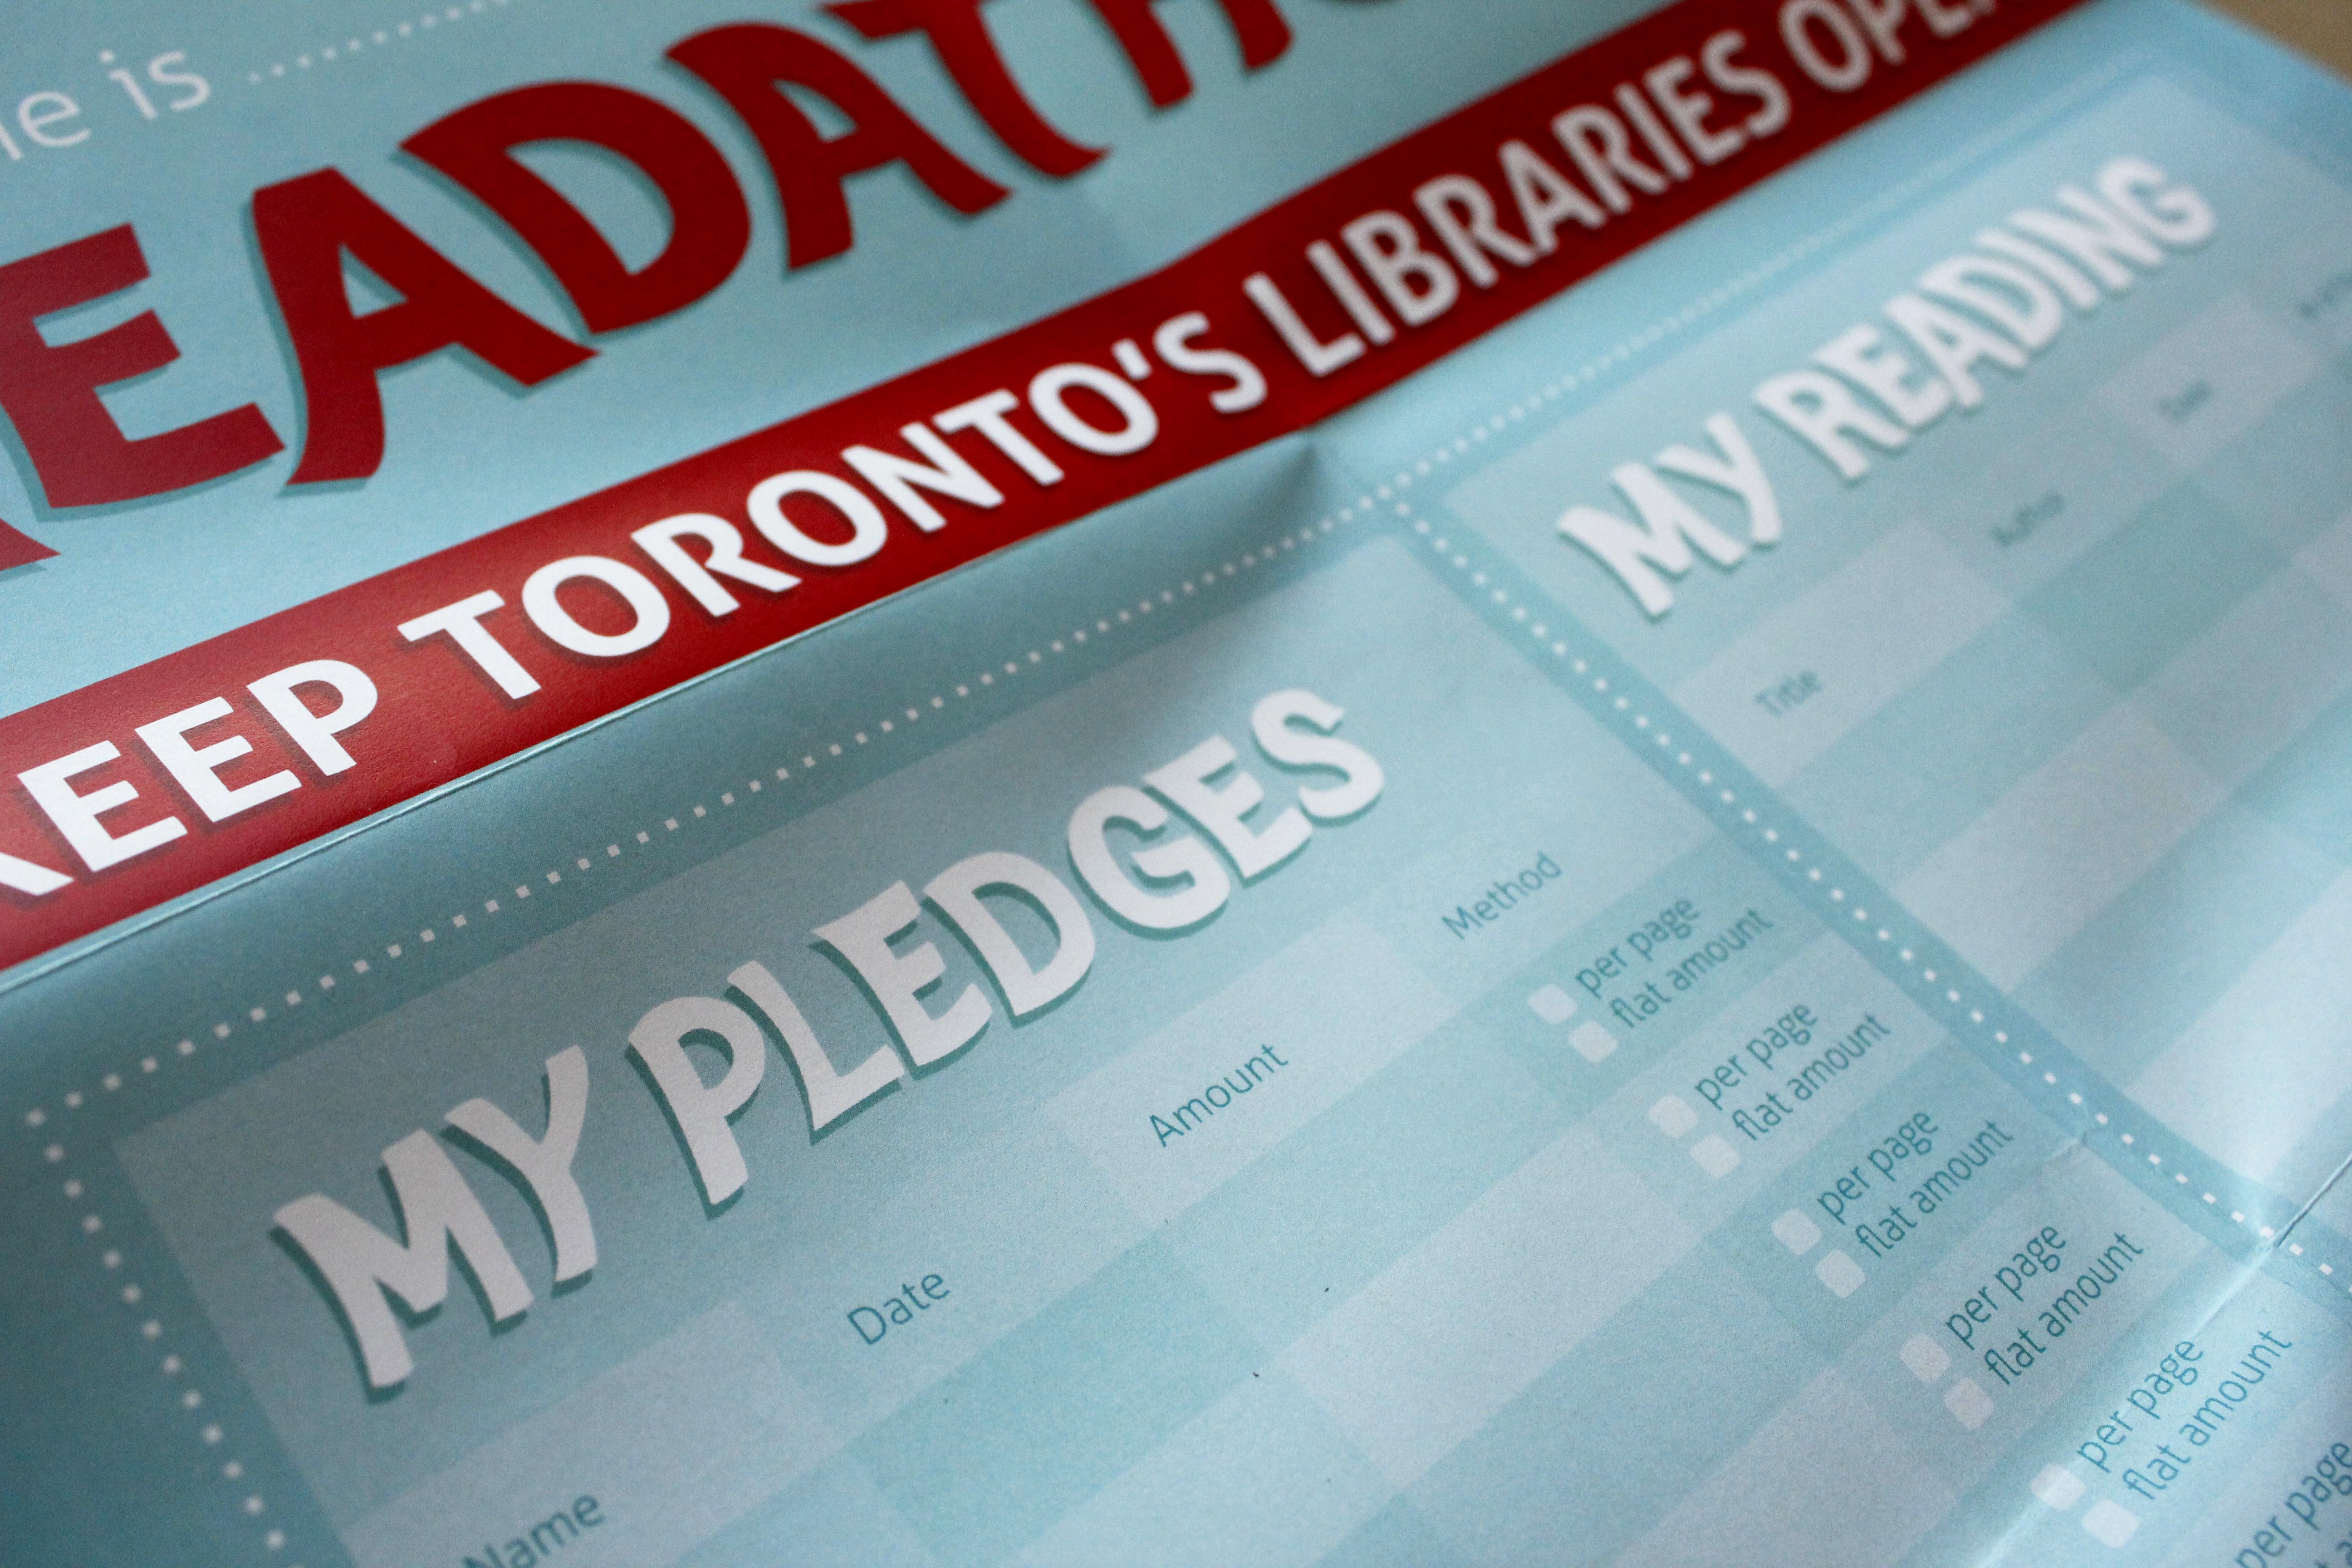 Toronto Library Readathon Package